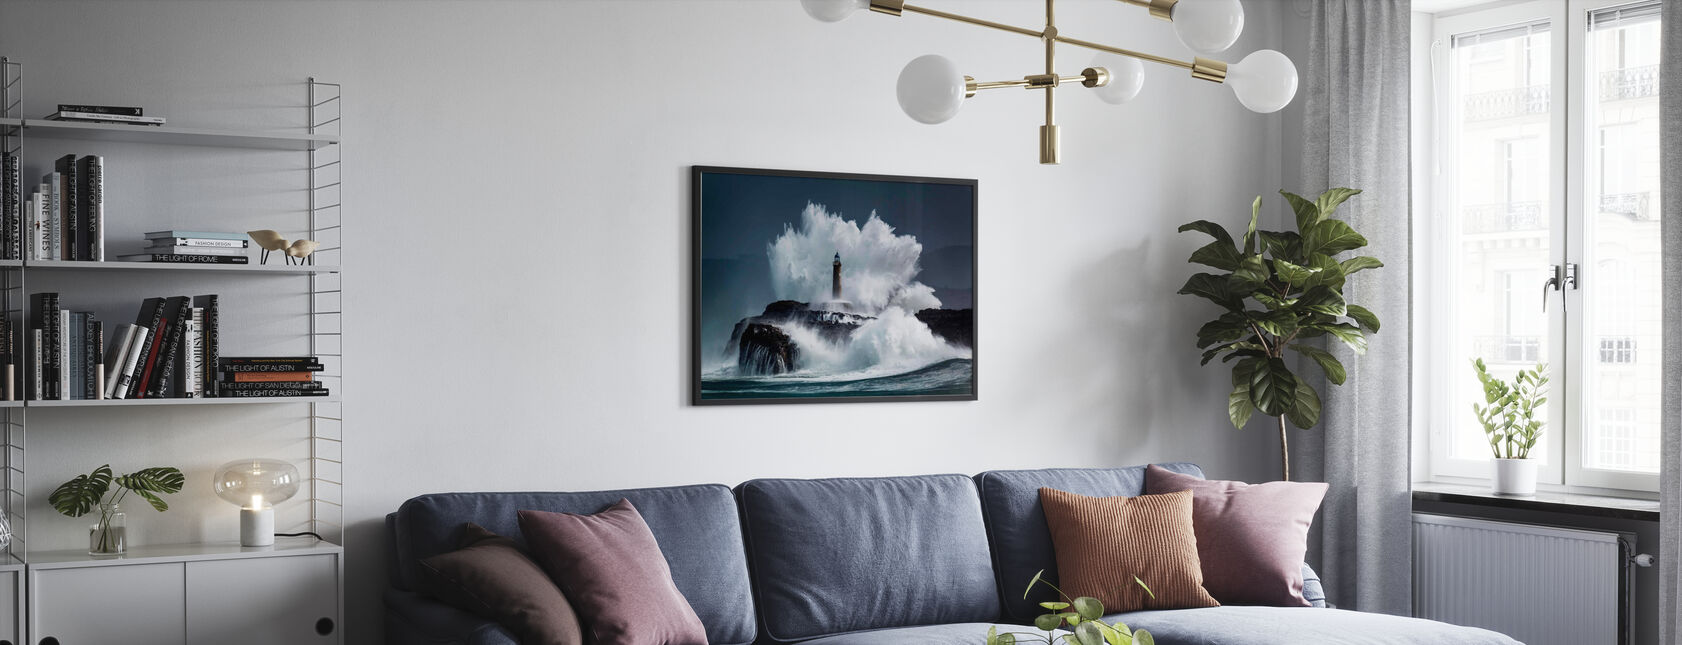 Comb - Framed print - Living Room